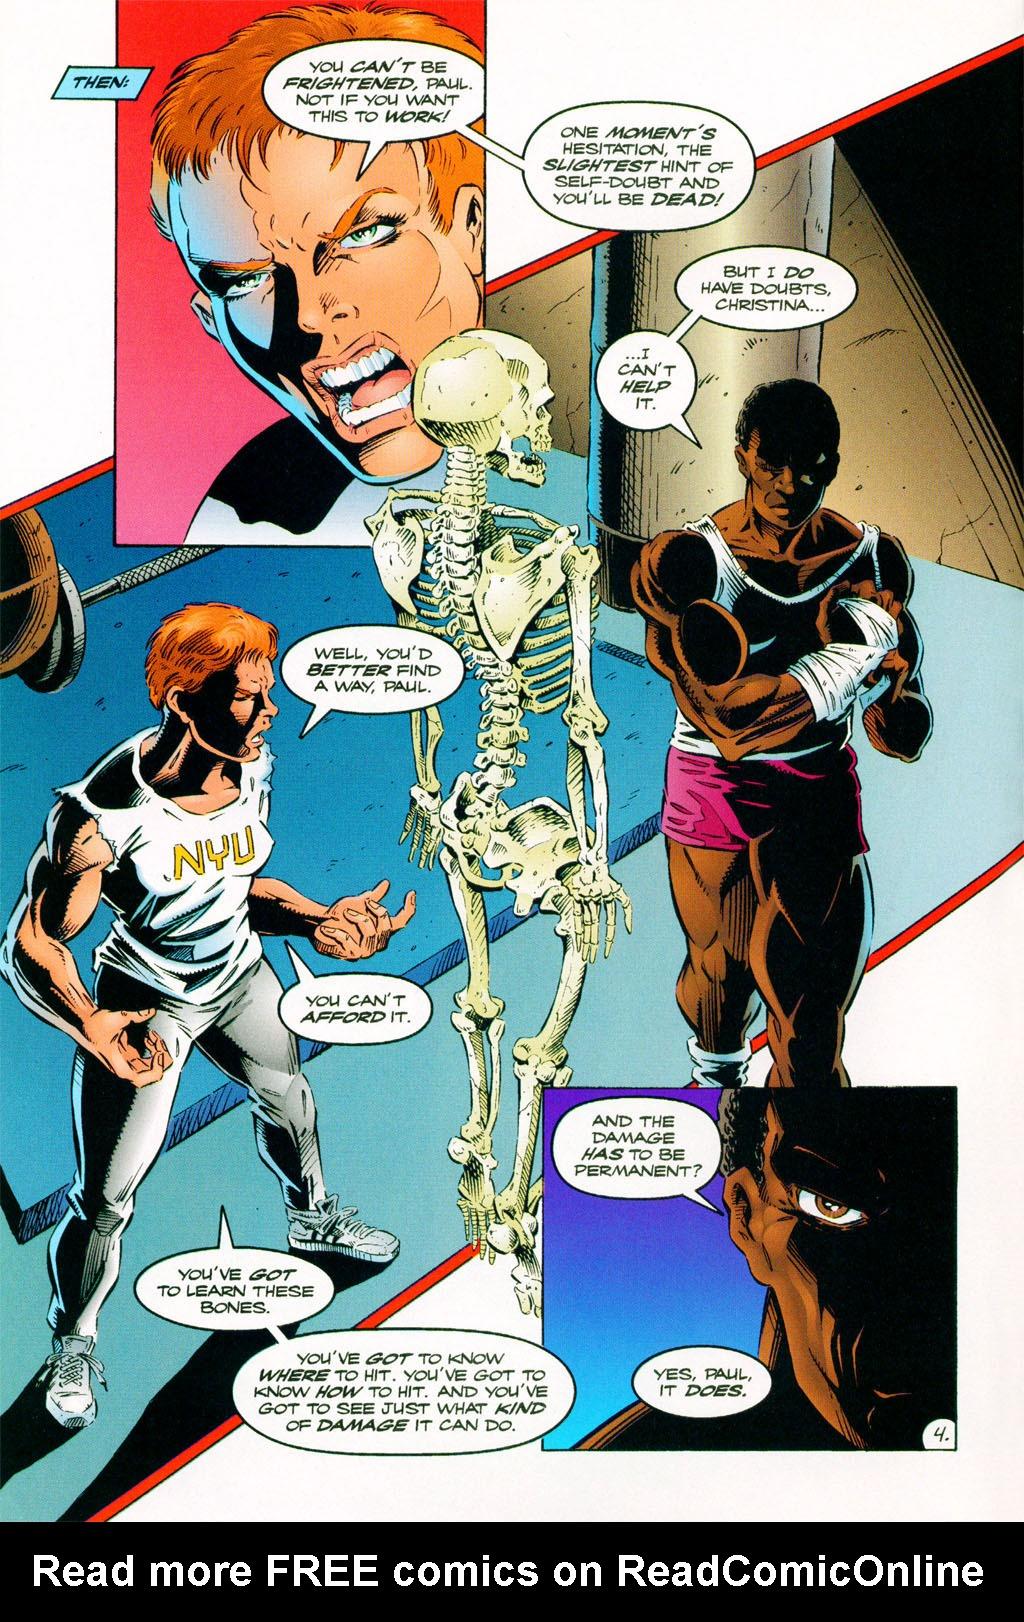 Read online ShadowHawk comic -  Issue #11 - 5